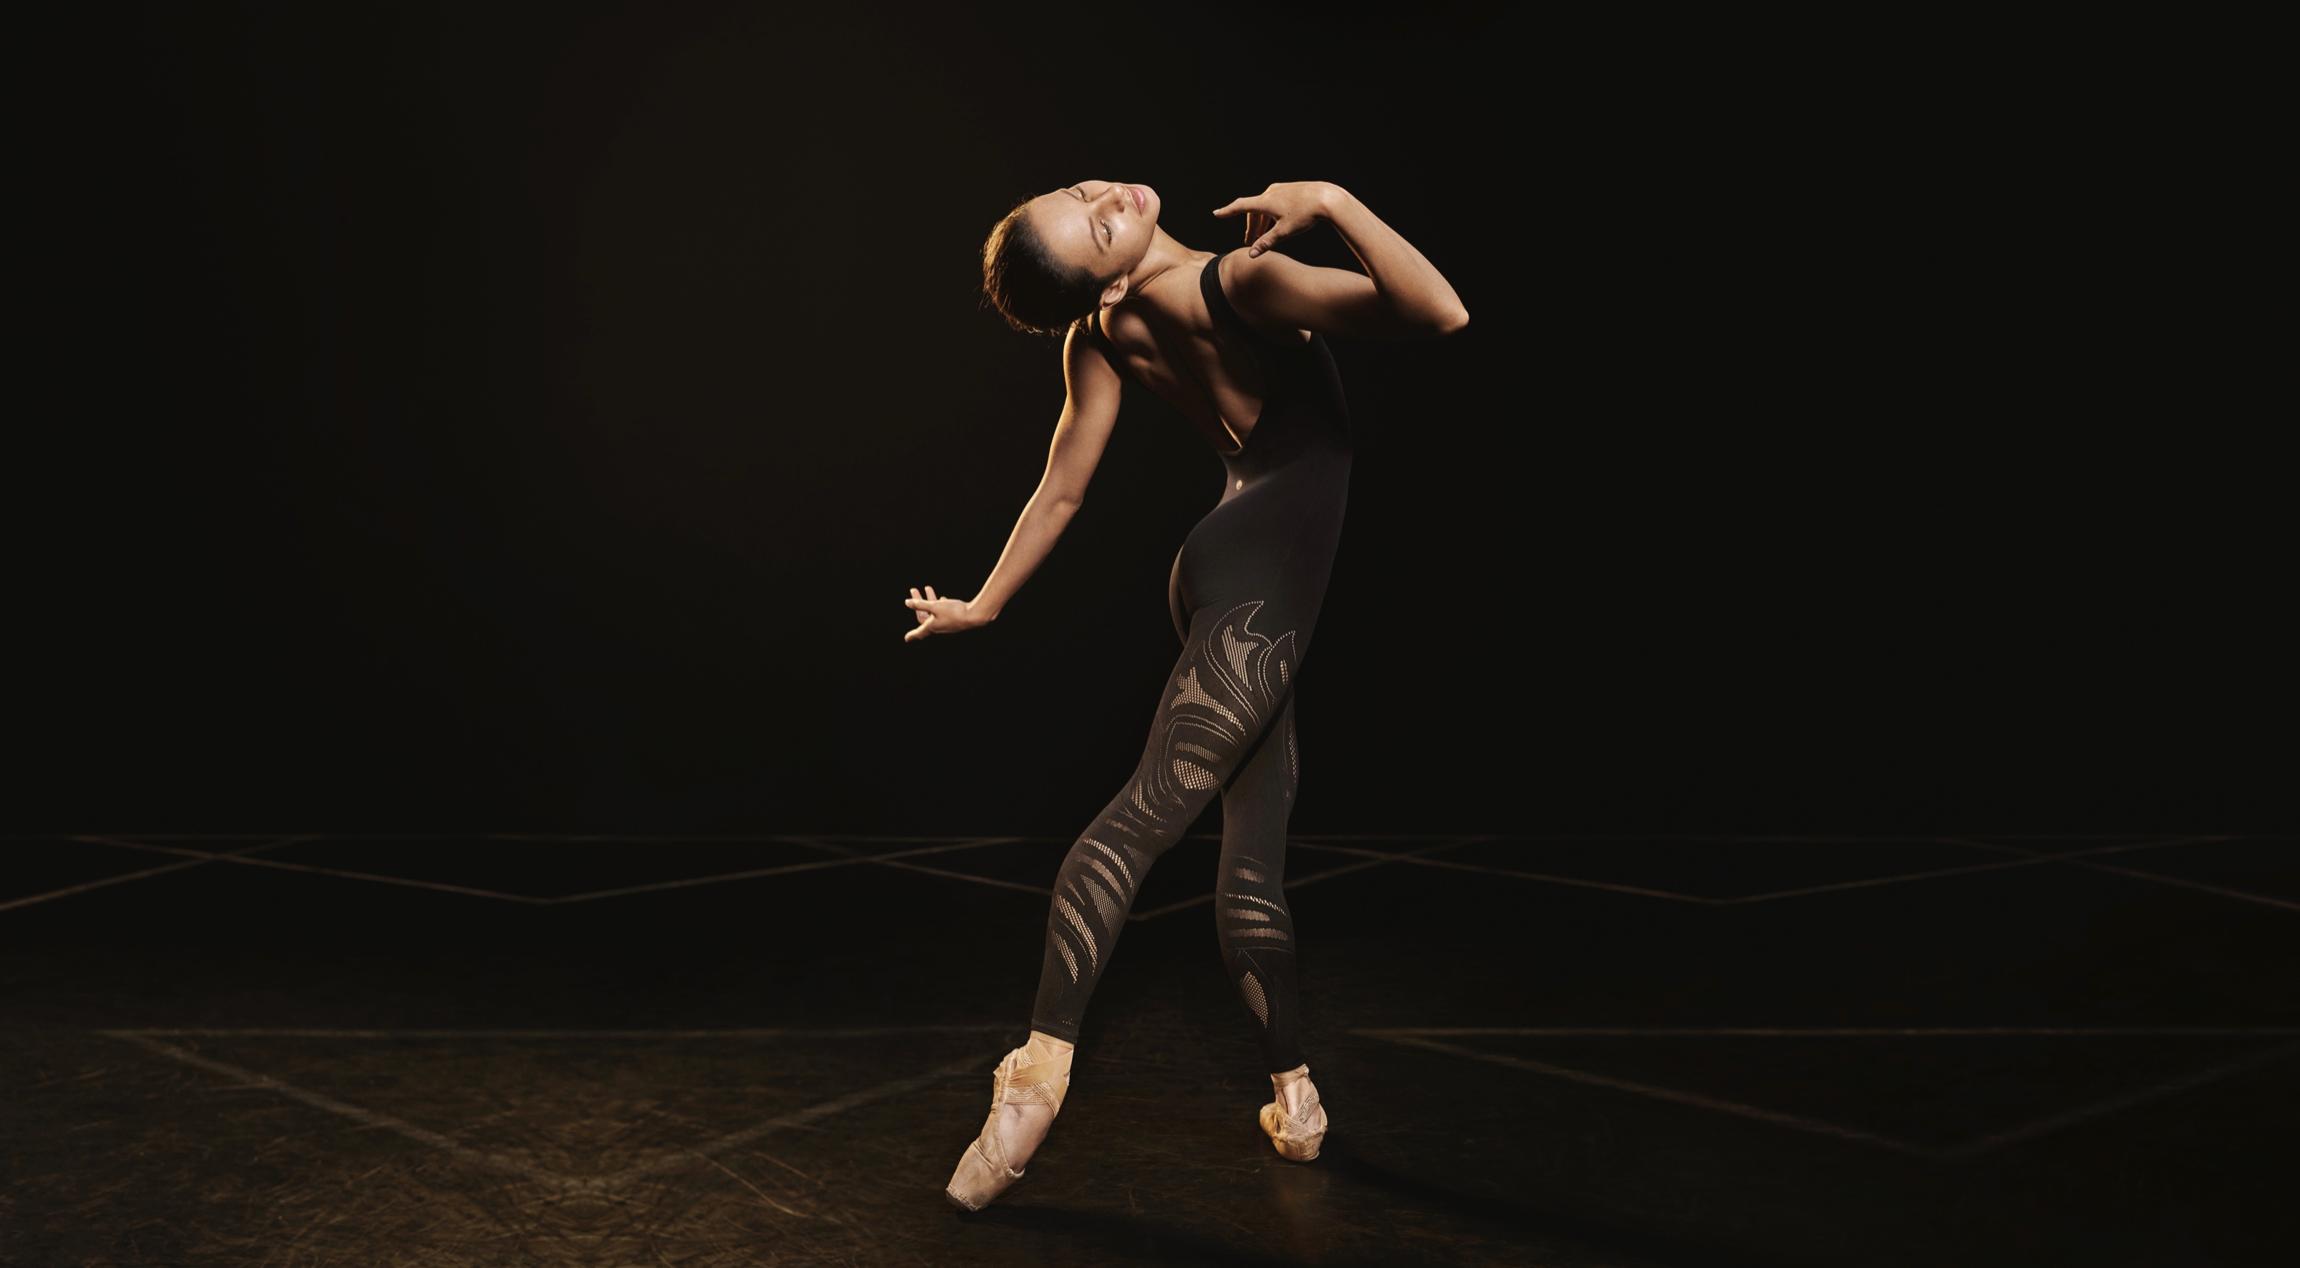 Ballerina Francesca Hayward dancing while wearing Lululemon apparel.